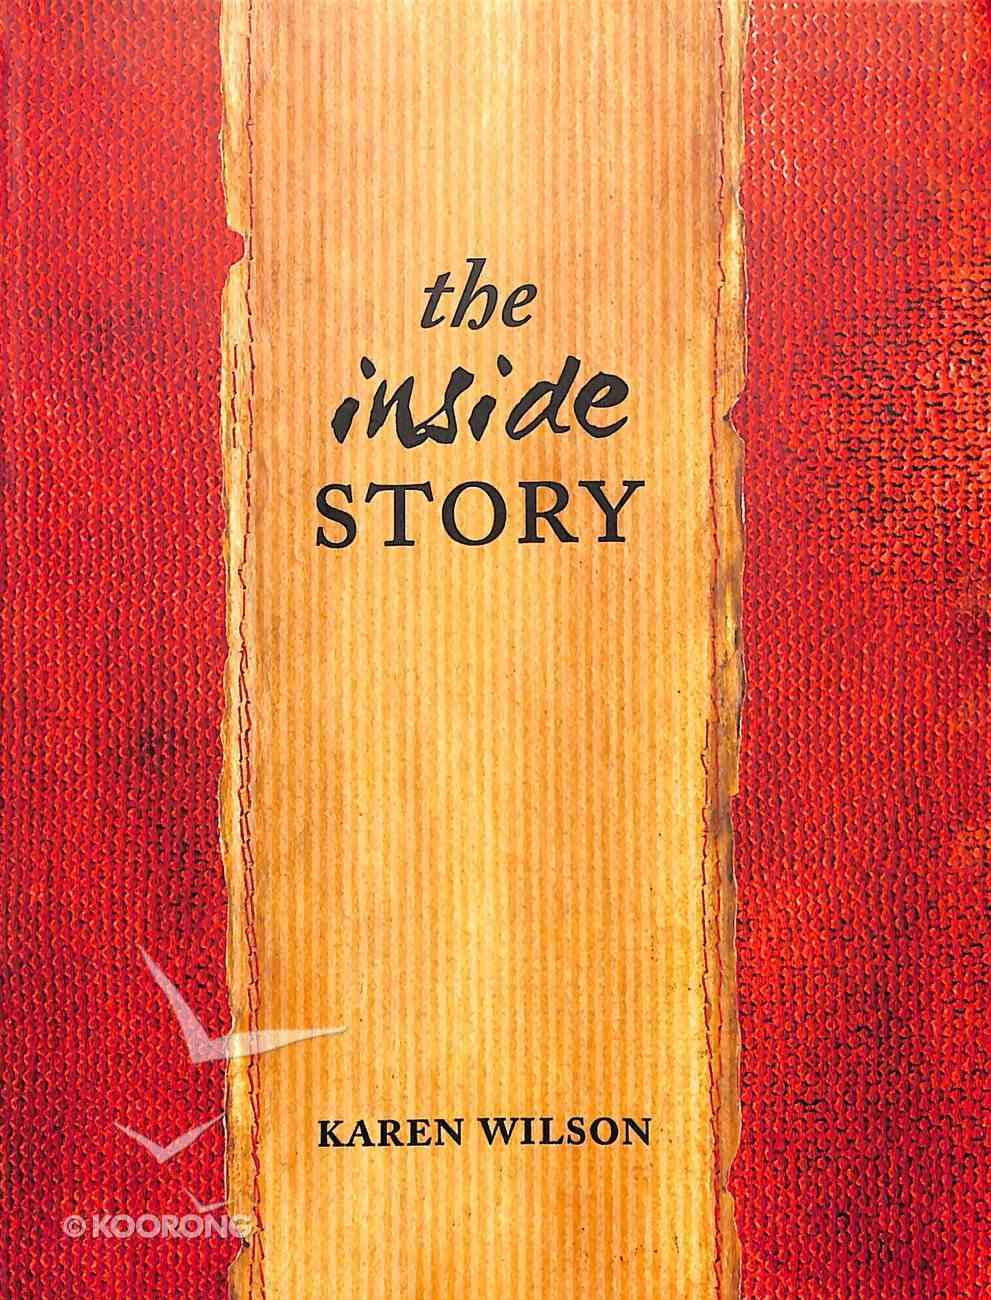 The Inside Story Paperback